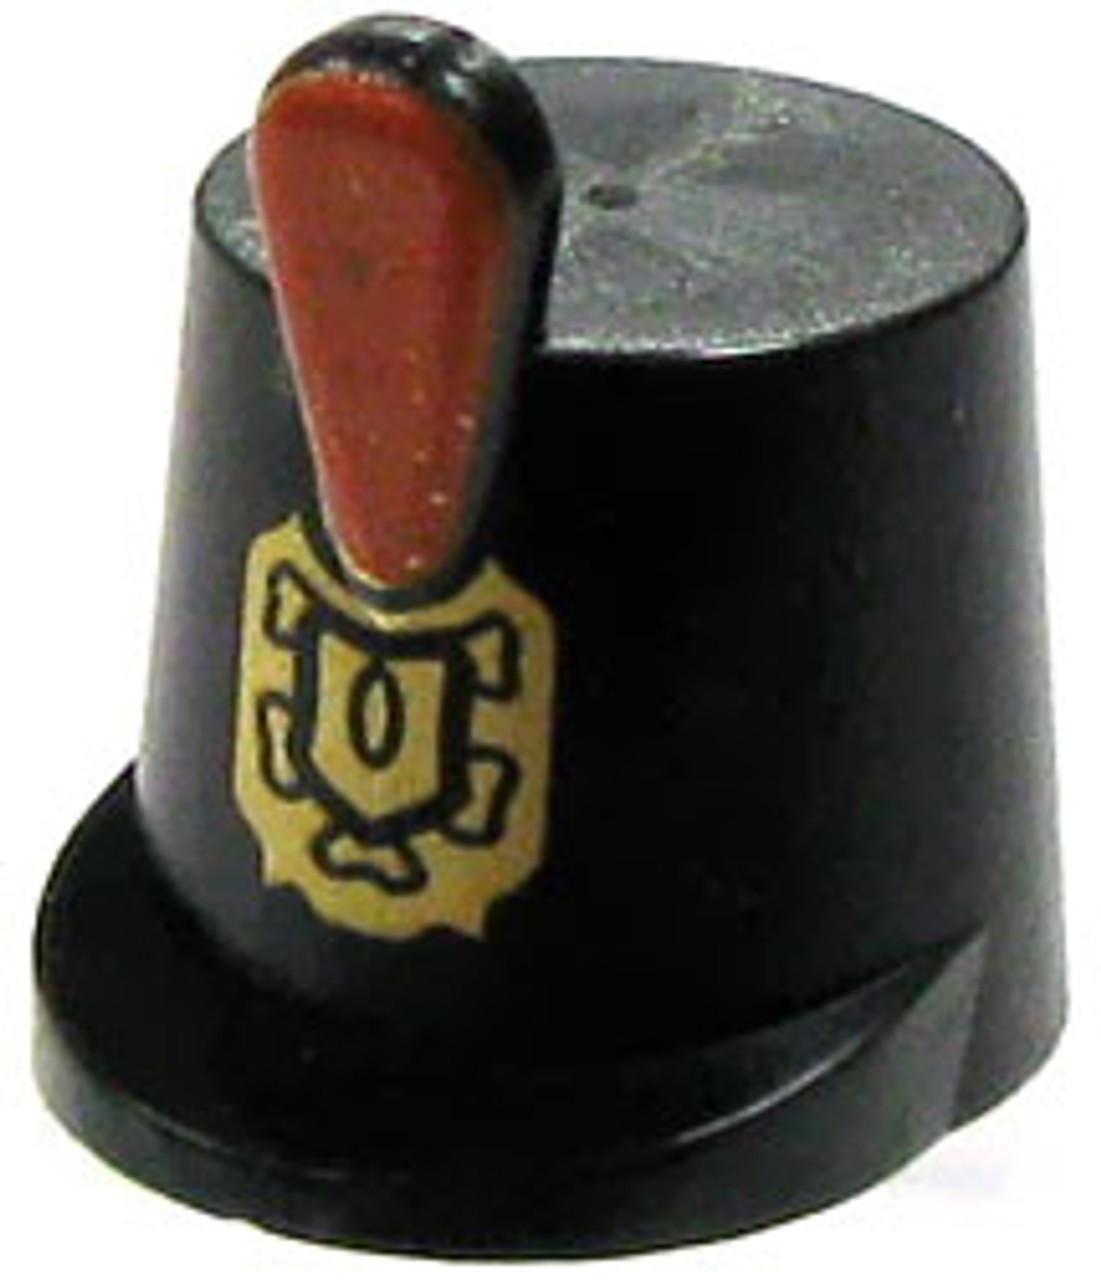 LEGO Minifigure Parts Black Navy Shako Minifigure Accessory [Loose]